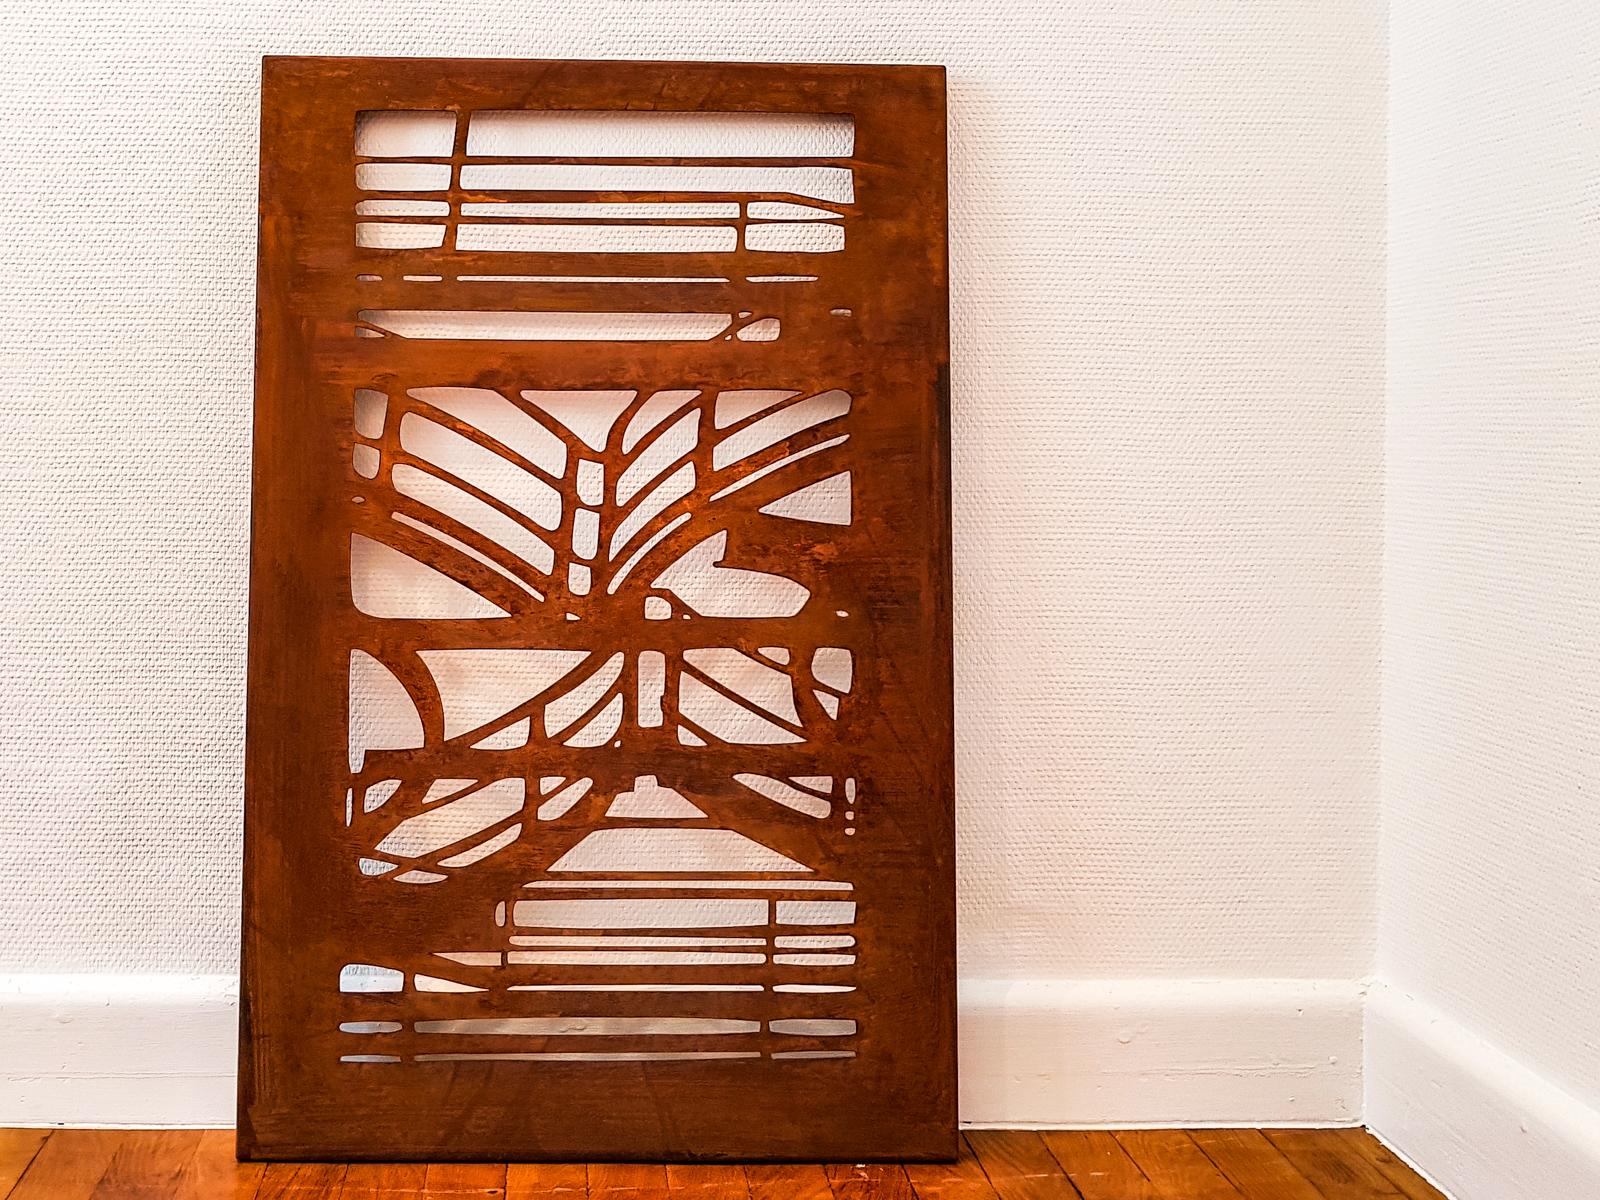 shadows of industrial past 3 - Metal Plate60 x 90 cmEUR 4.500